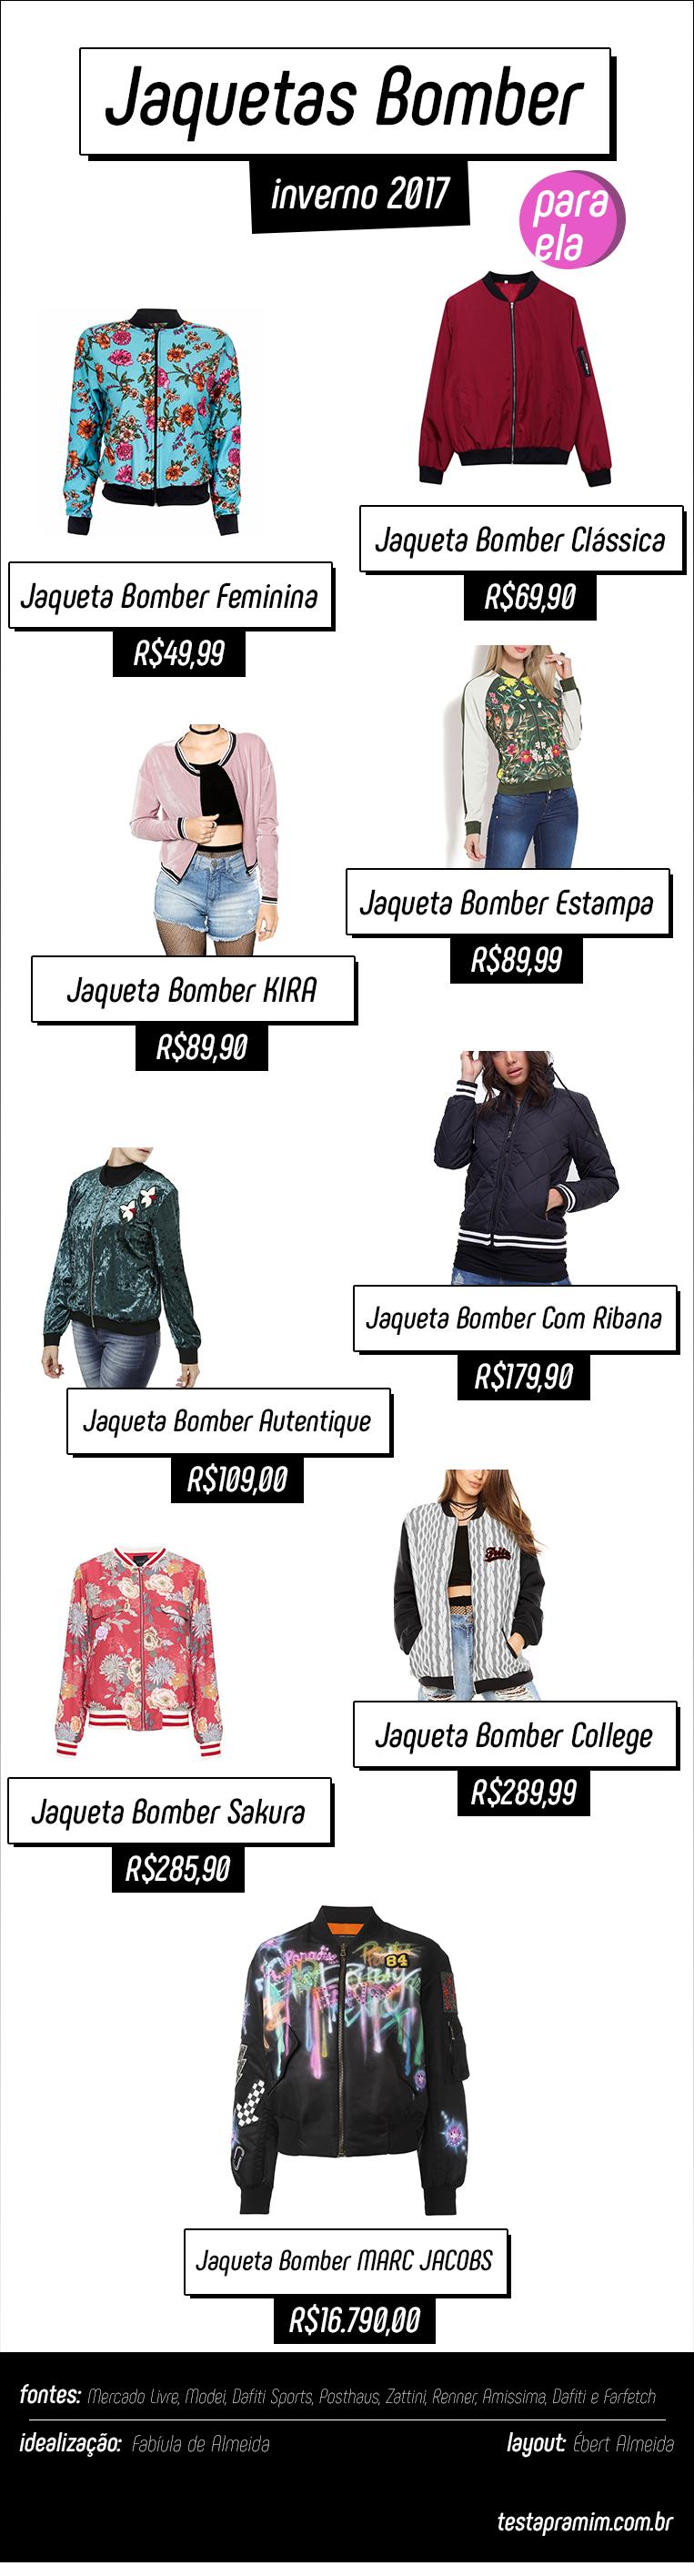 Jaquetas Bomber inverno 2017